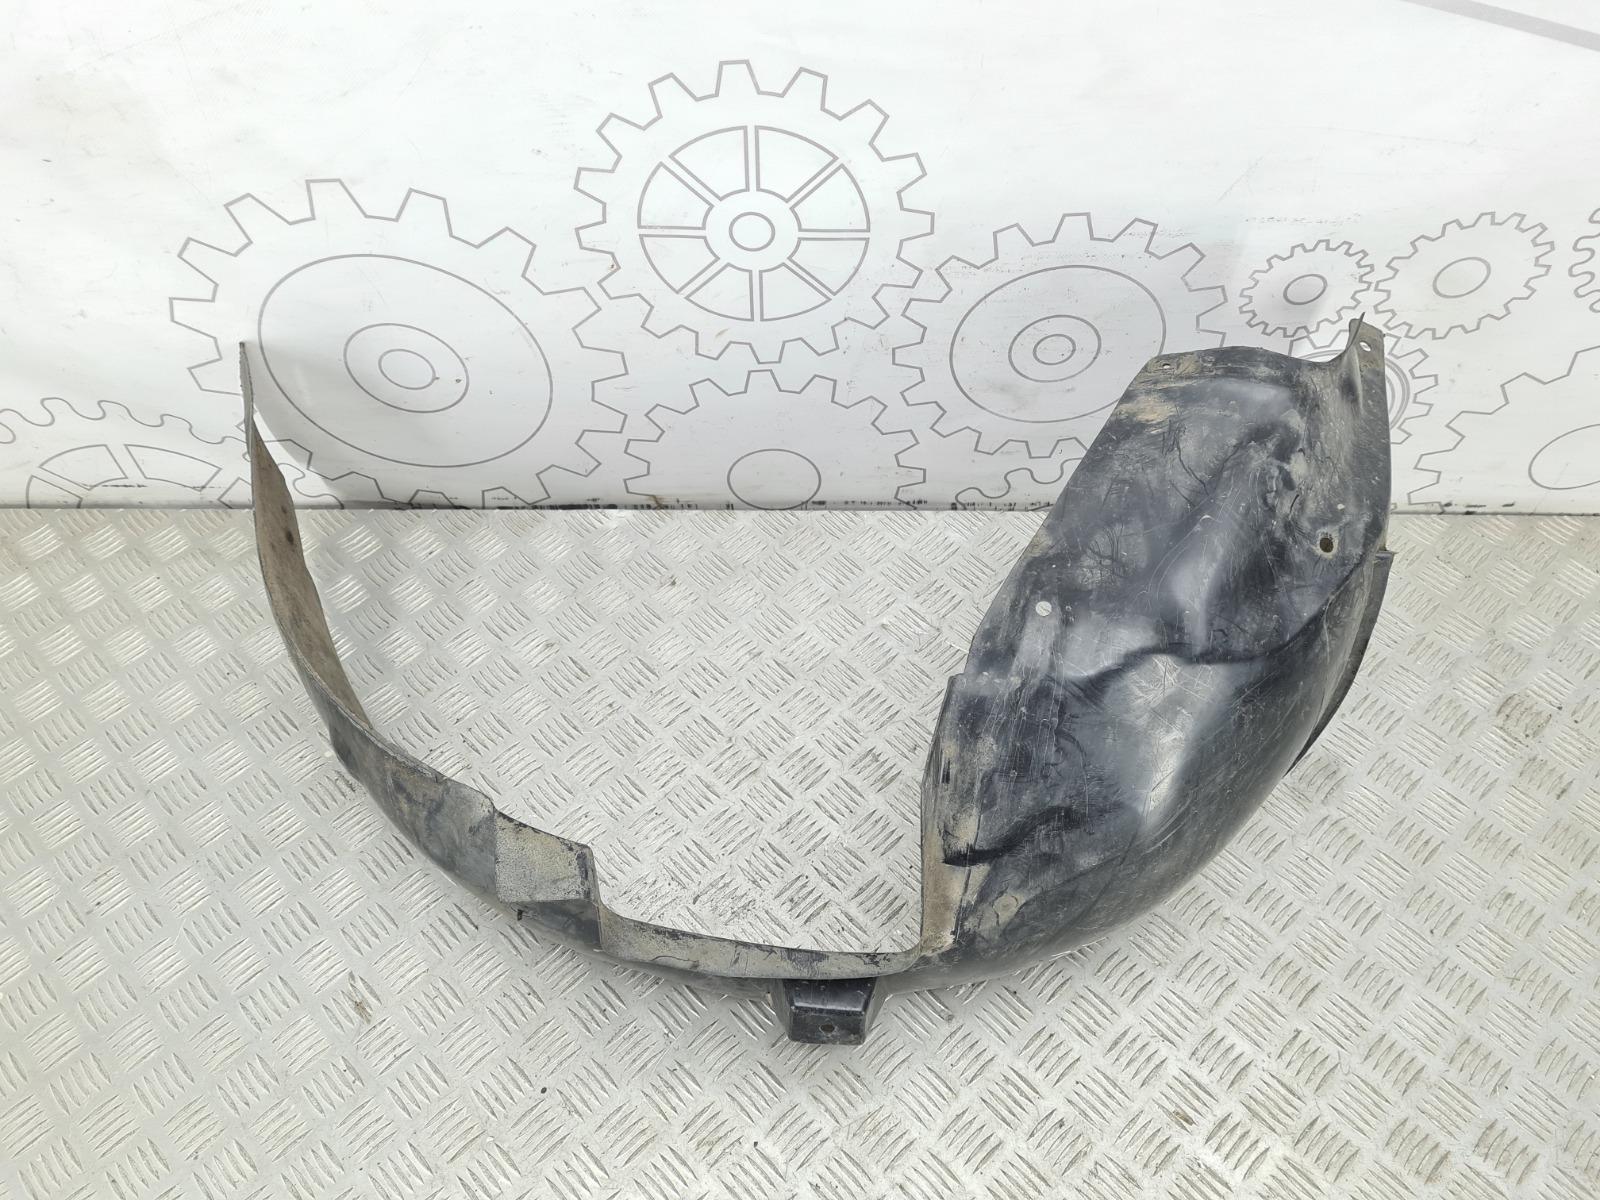 Защита арок передняя правая (подкрылок) Opel Vectra C 1.9 CDTI 2006 (б/у)